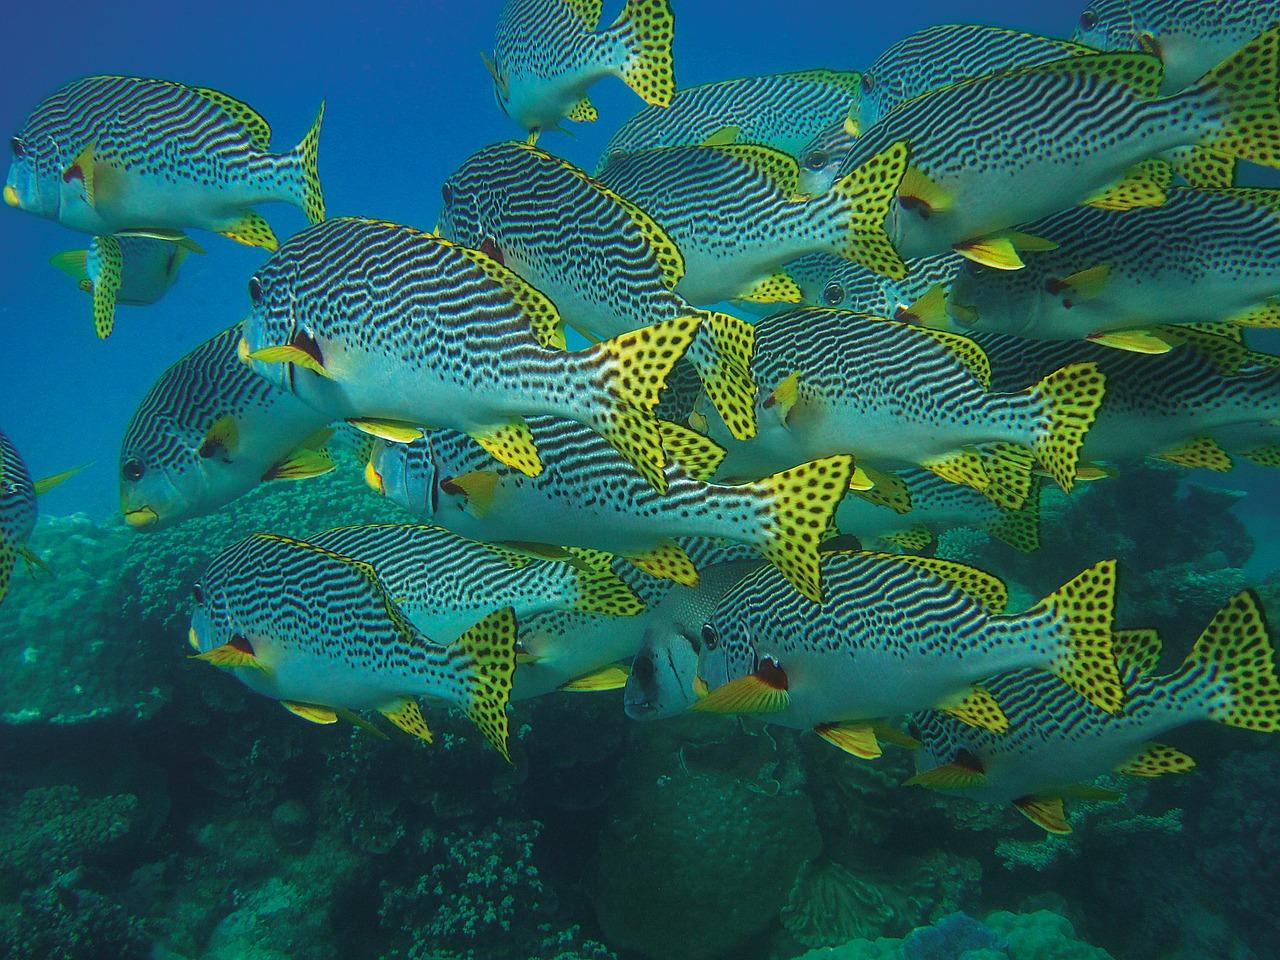 fish-swarm-432821_1280.jpg